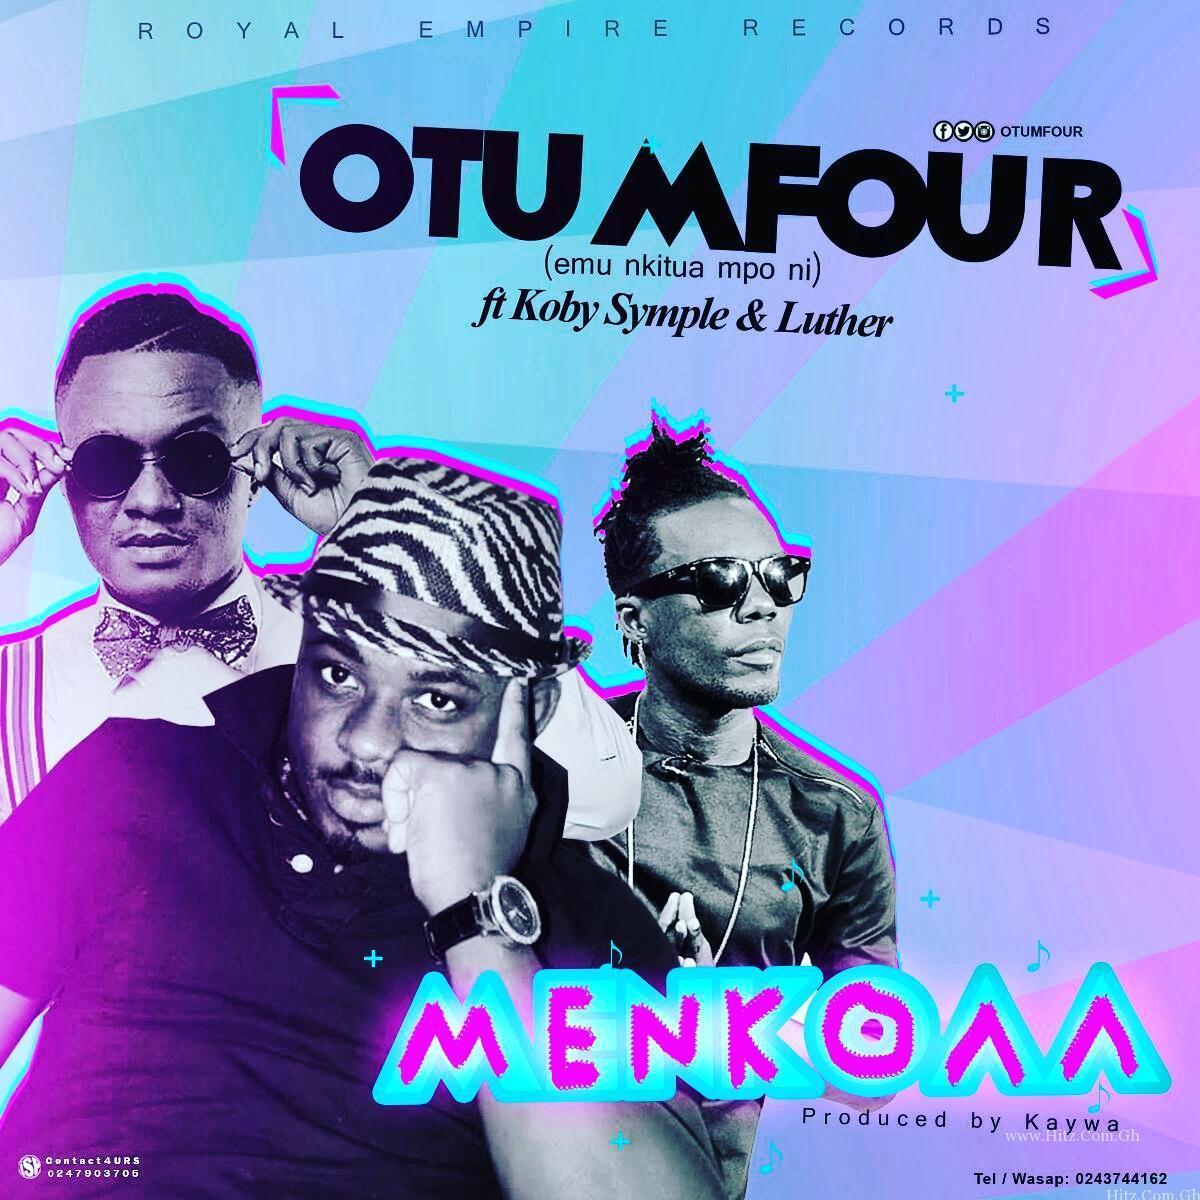 Otumfour – Menkoaa (Ft. Koby Symple x Luther) Prod. By Kaywa